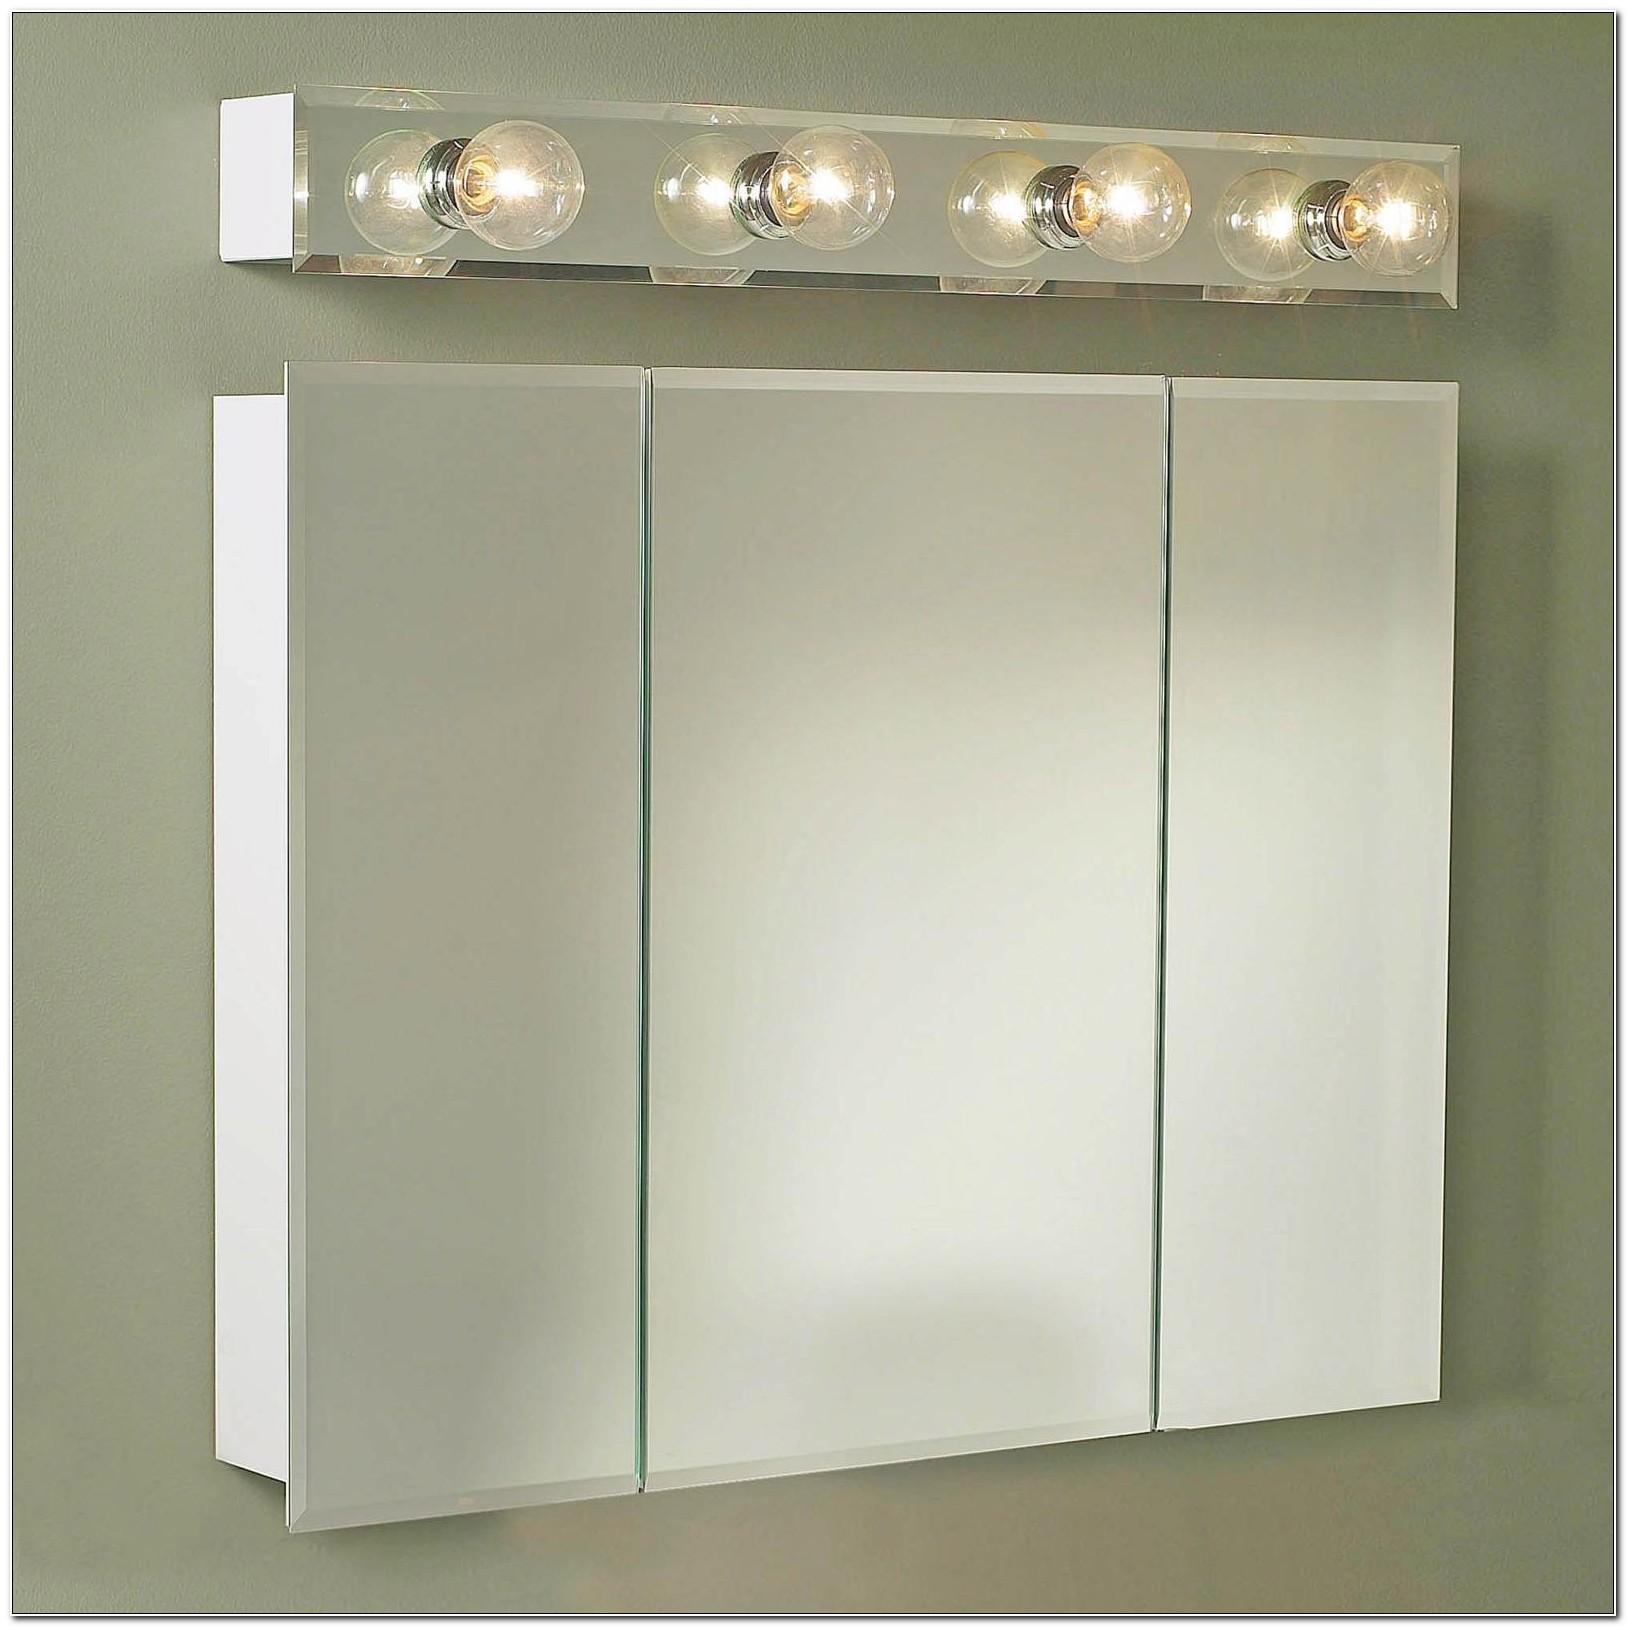 Surface Mount Medicine Cabinet With Side Lights